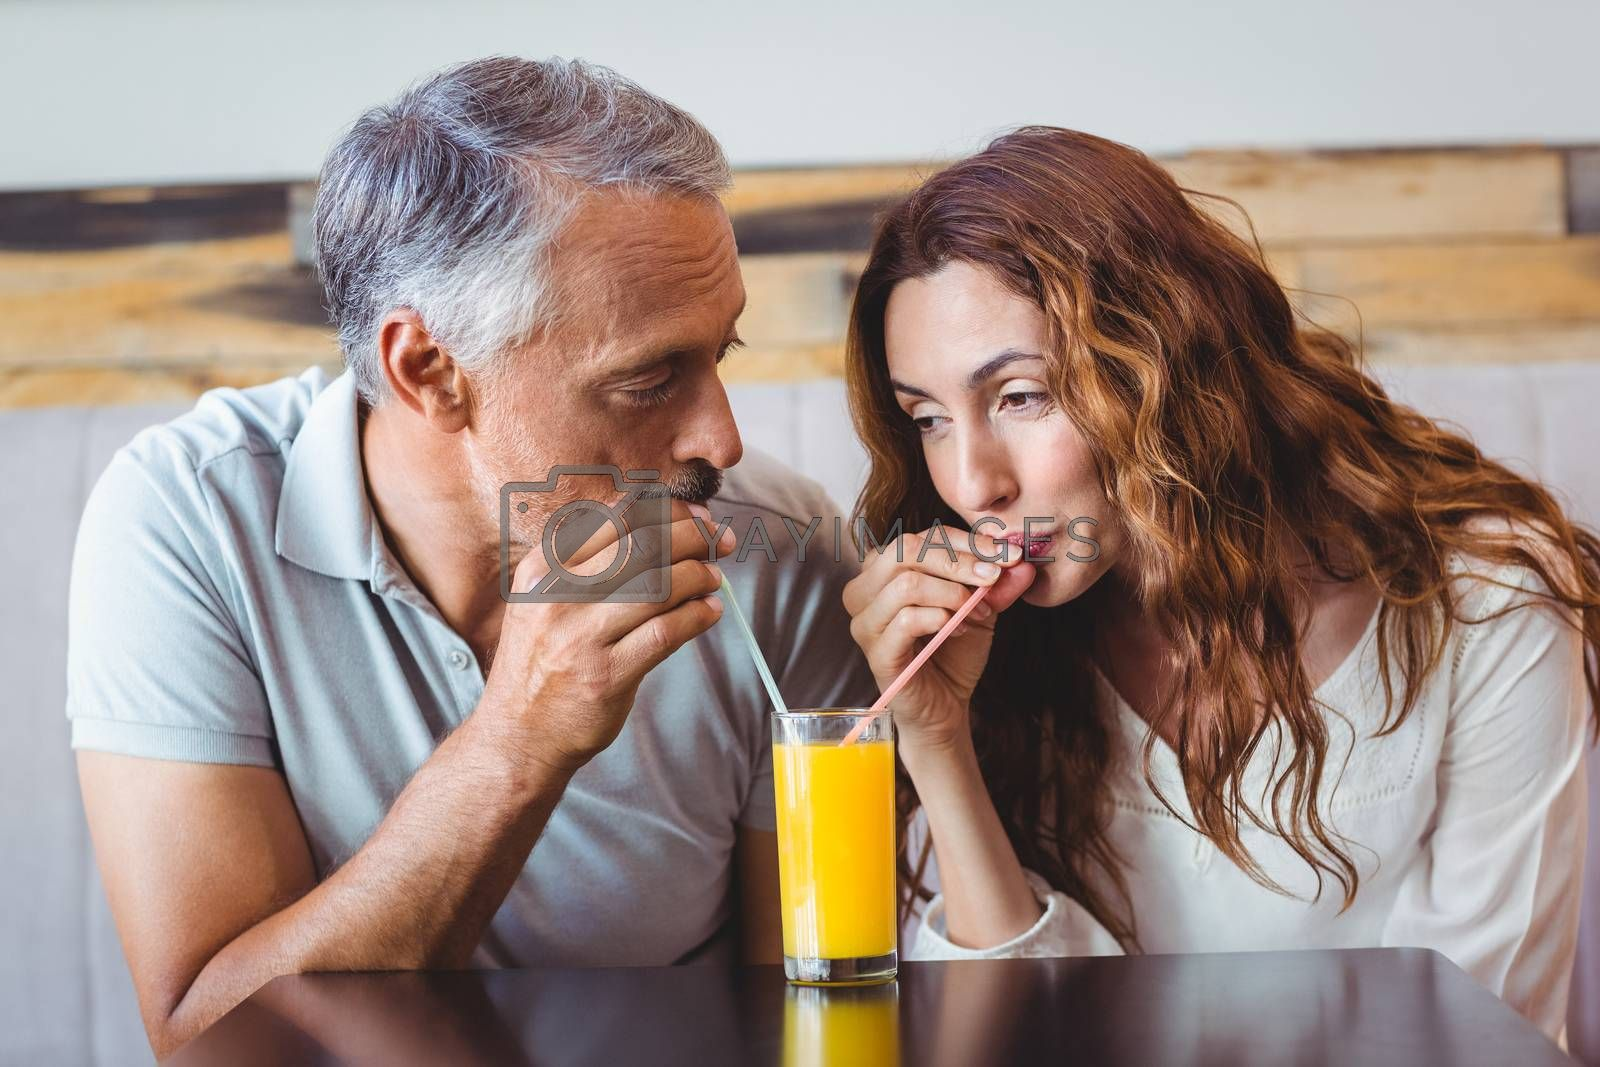 Royalty free image of cute couple having glass of orange juice by Wavebreakmedia